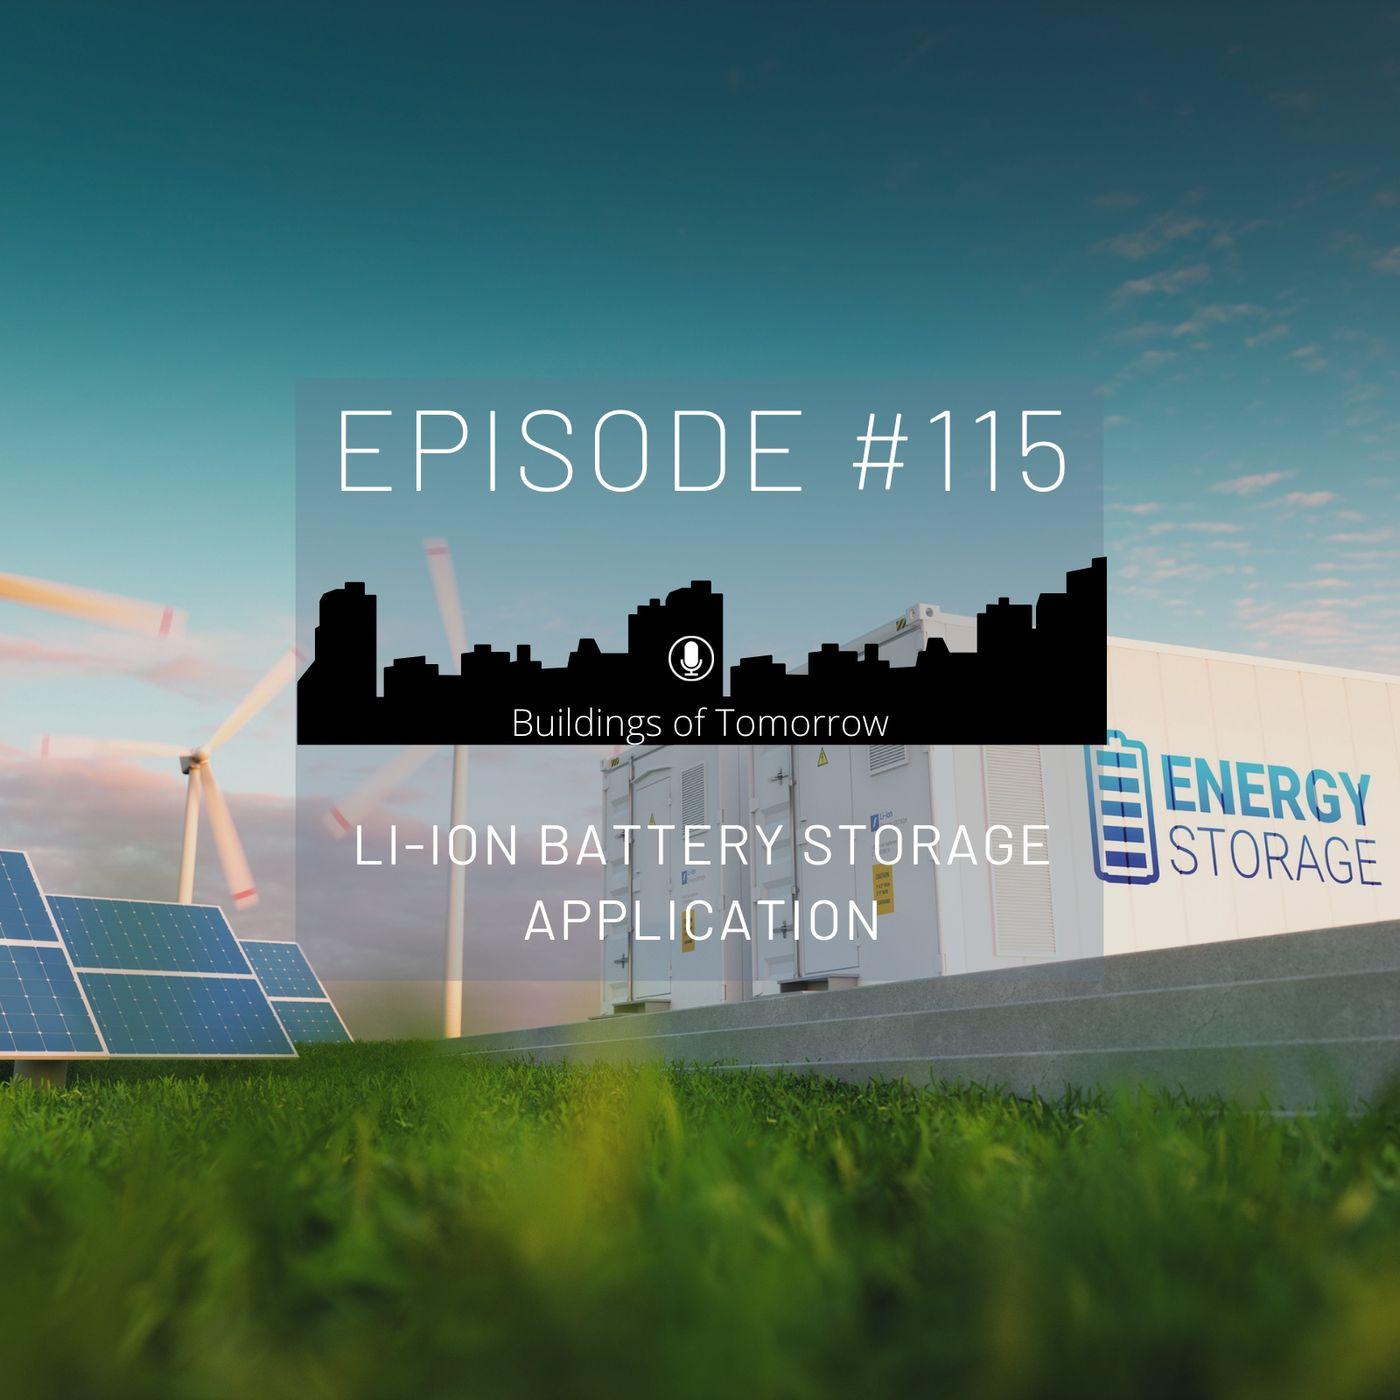 #115 Lithium-ION Battery Storage